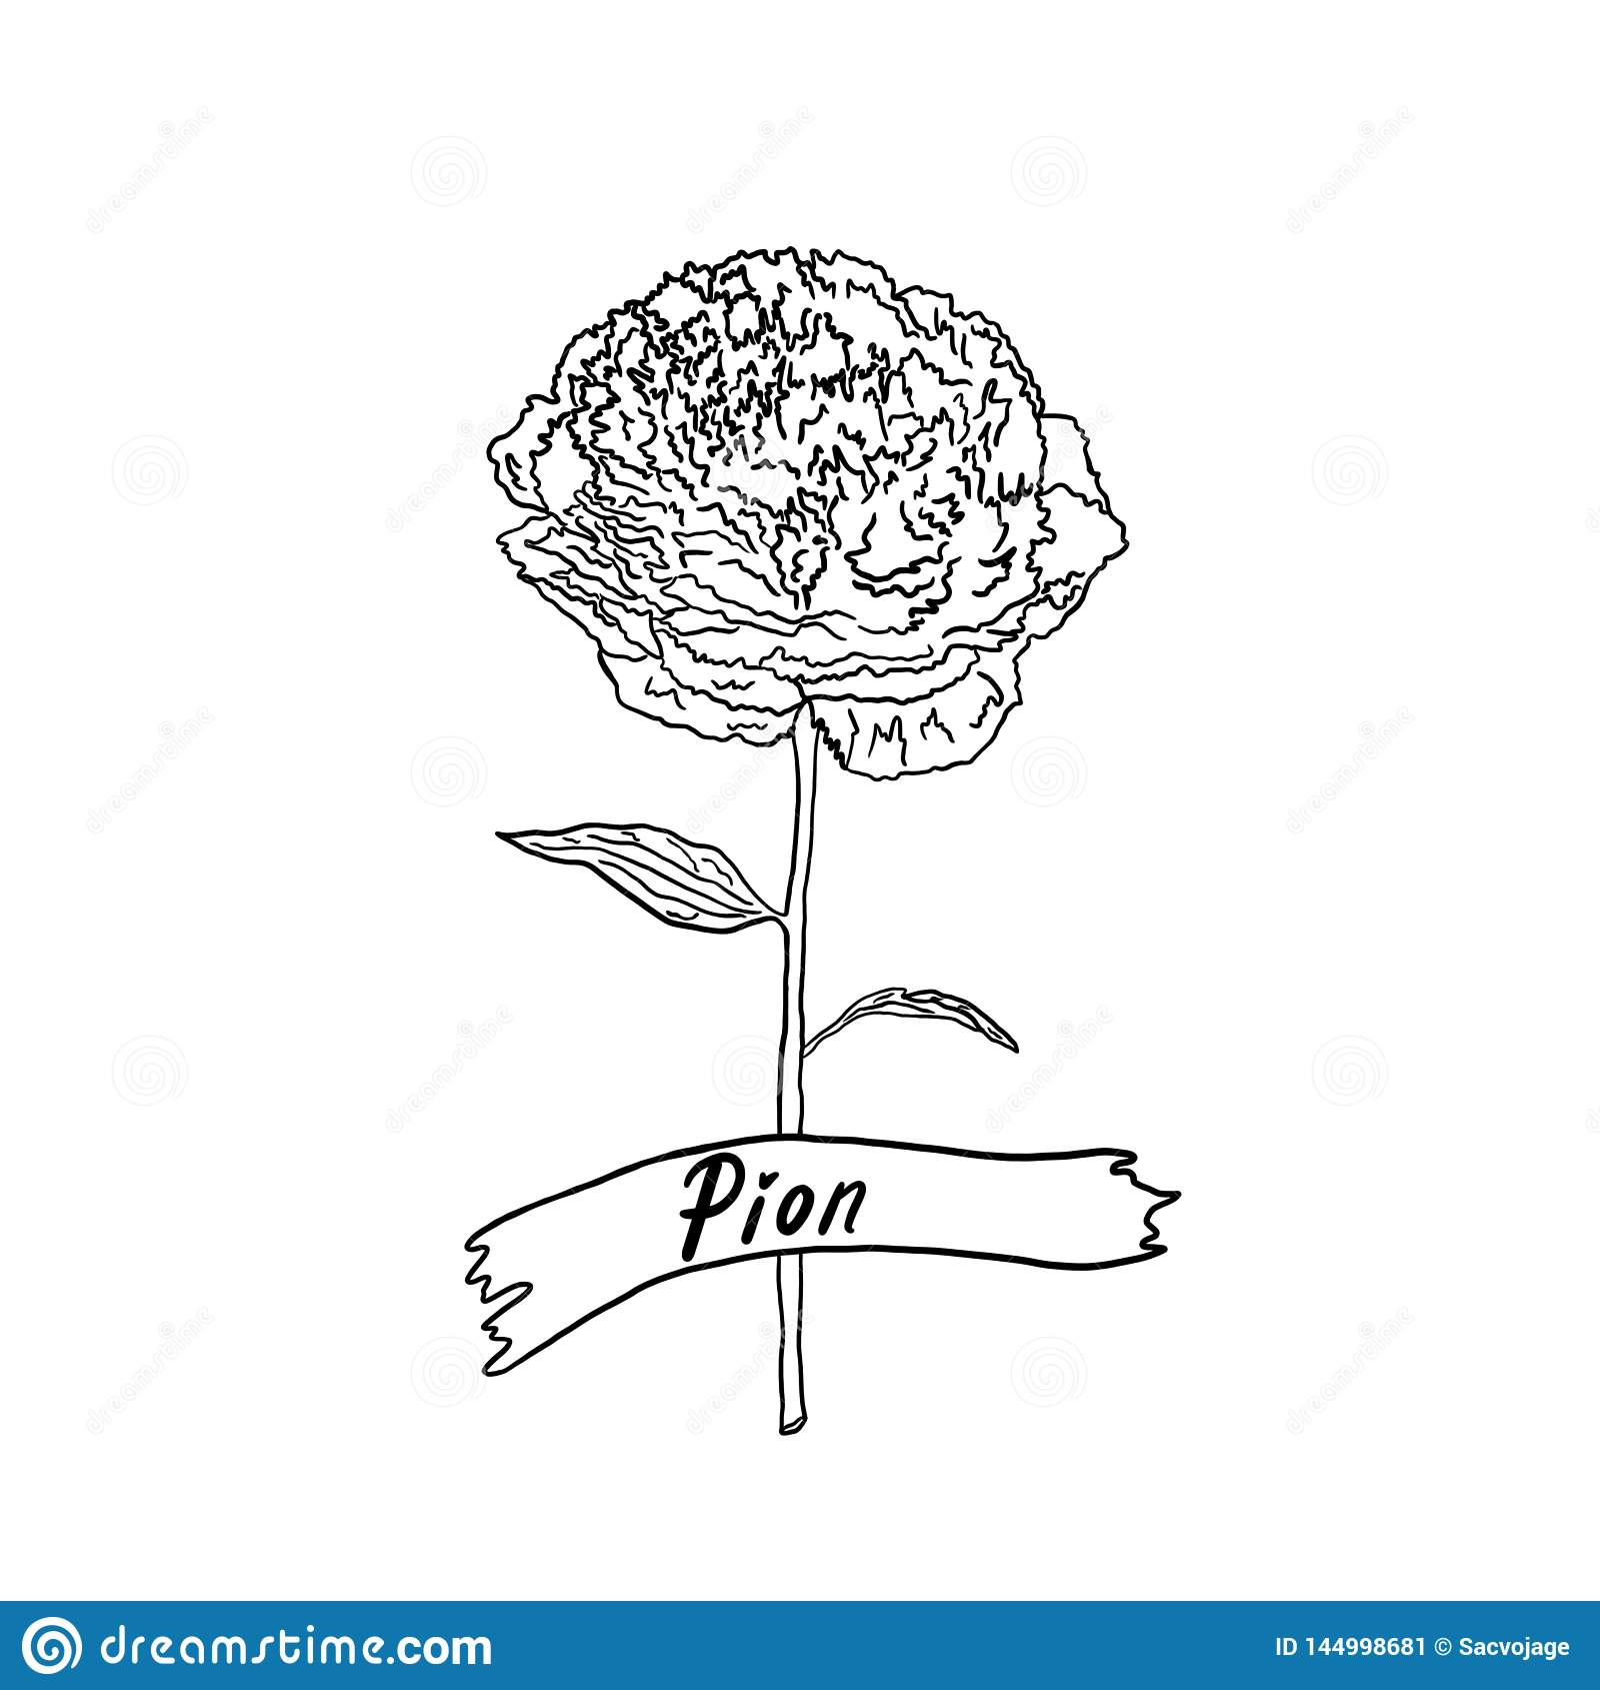 Pion flower on the stem. Black and white outline illustration.